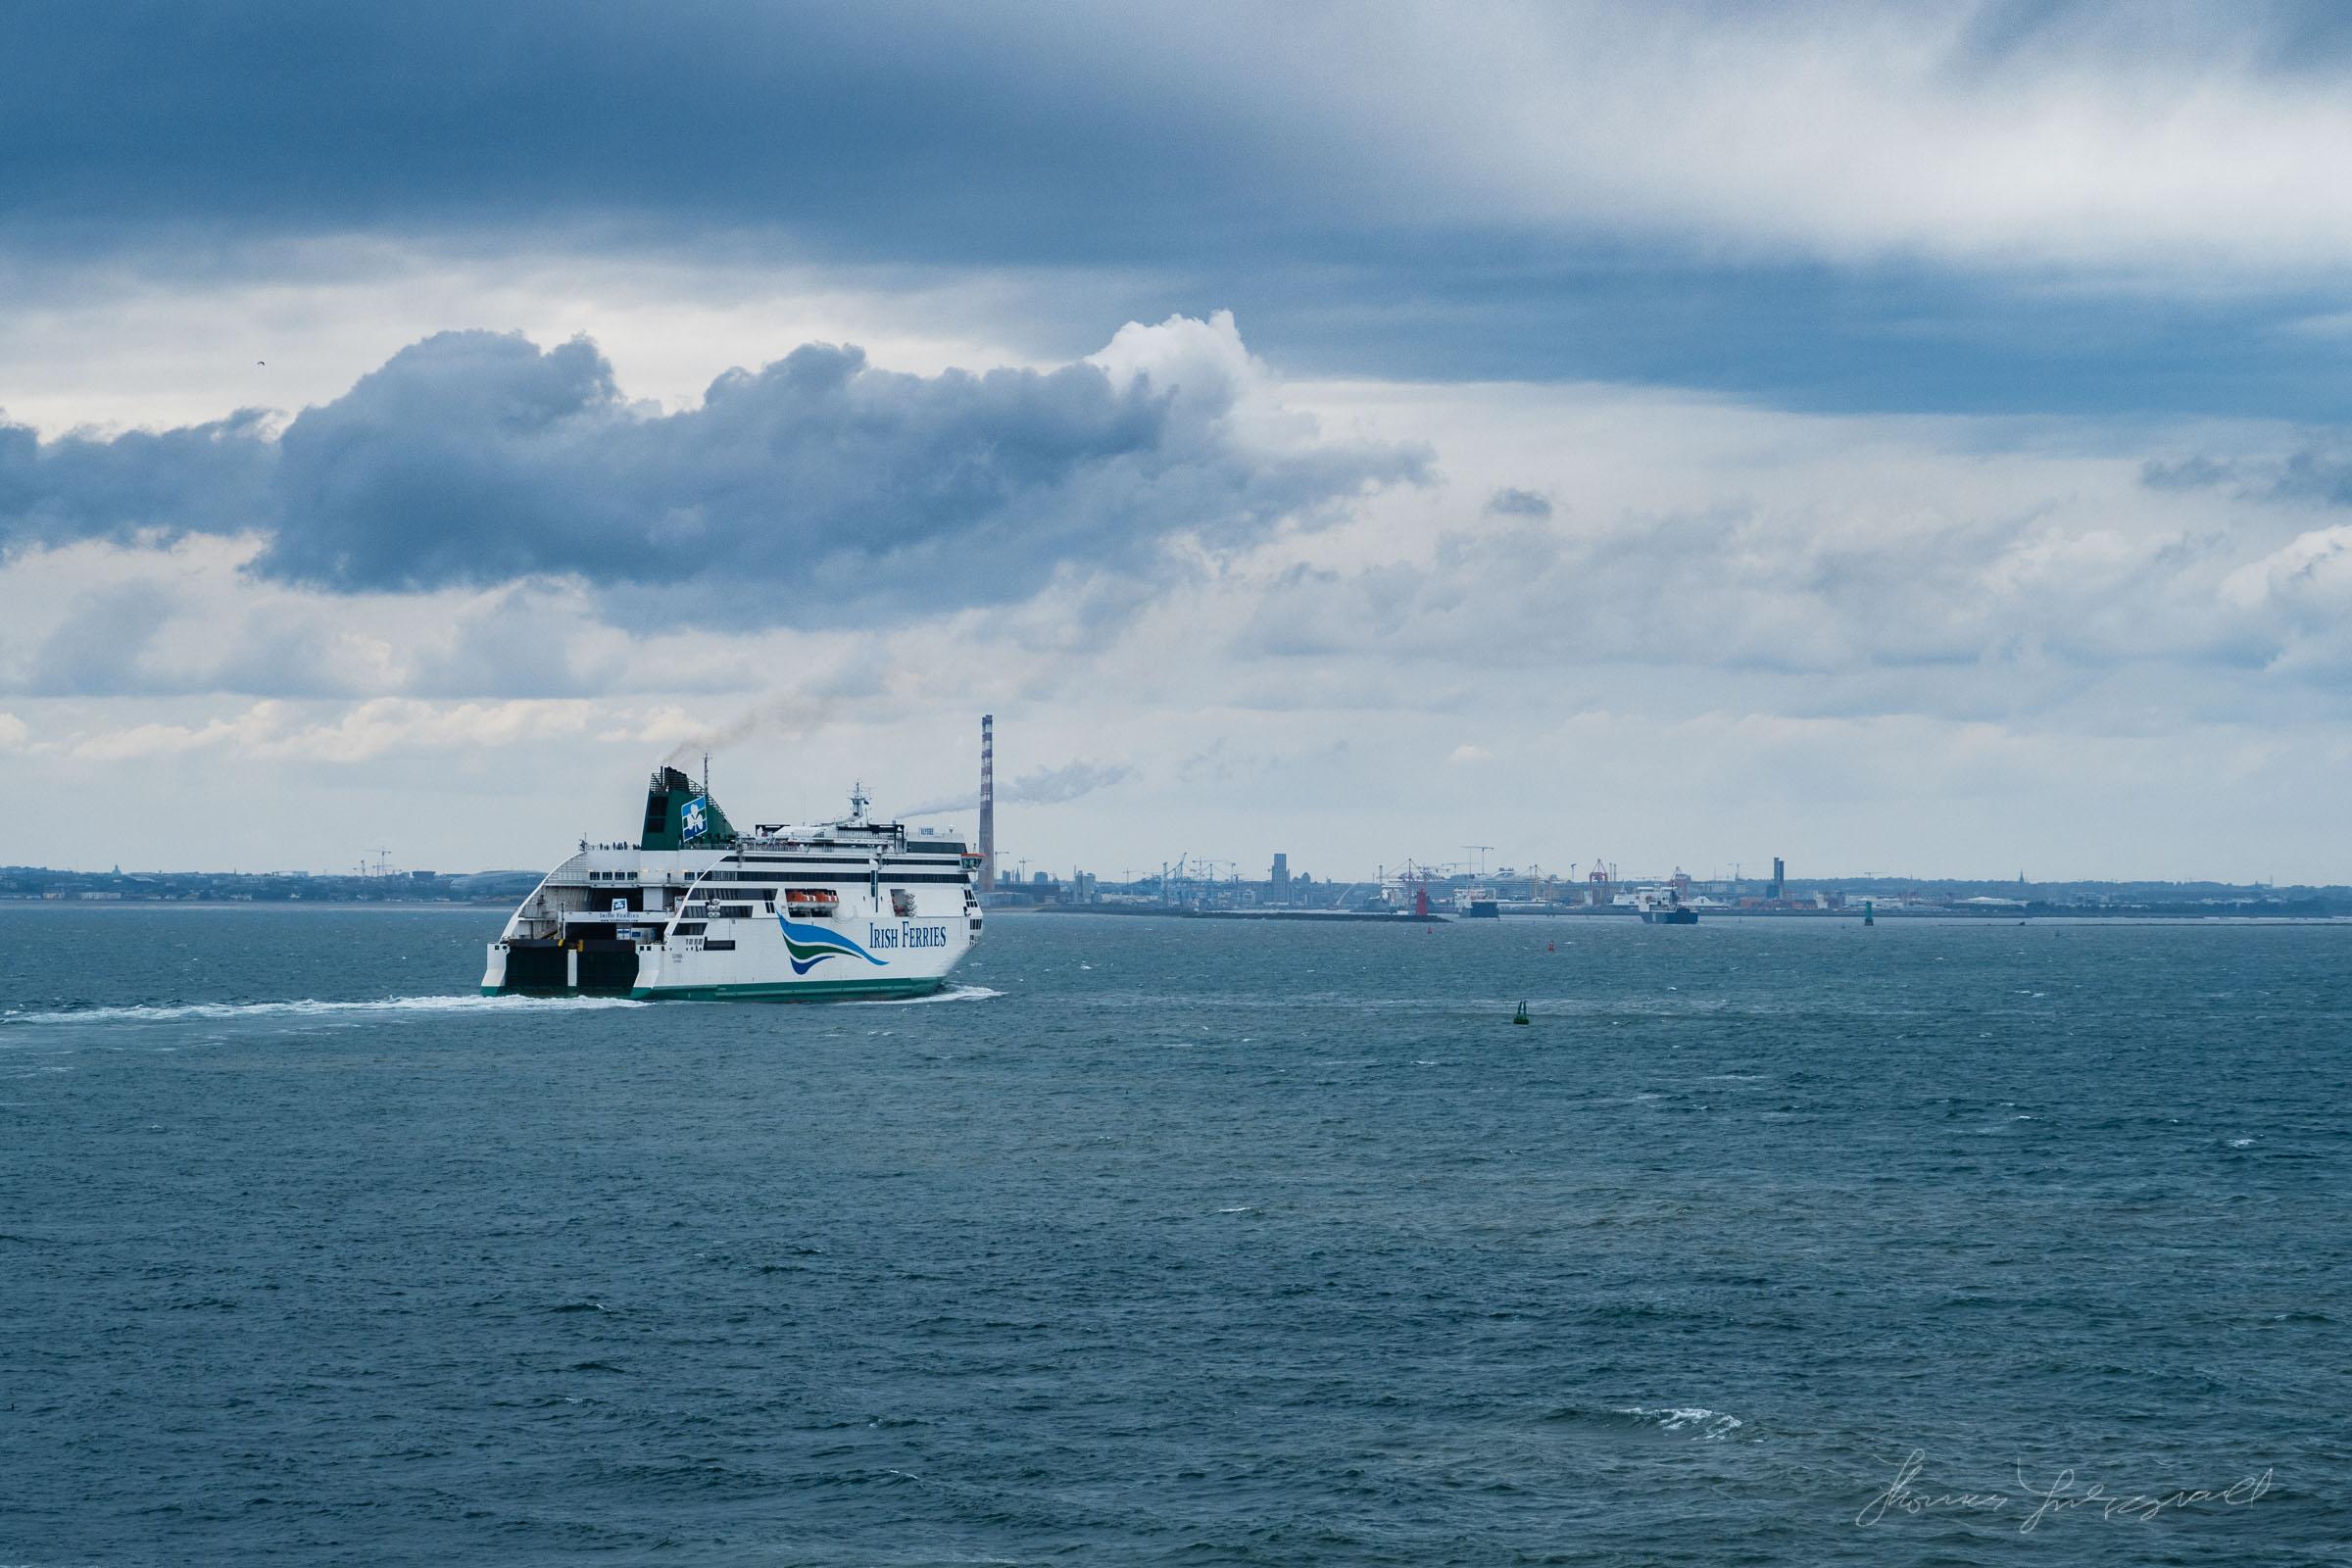 Irish Ferries Ulysees approaching Dublin Port